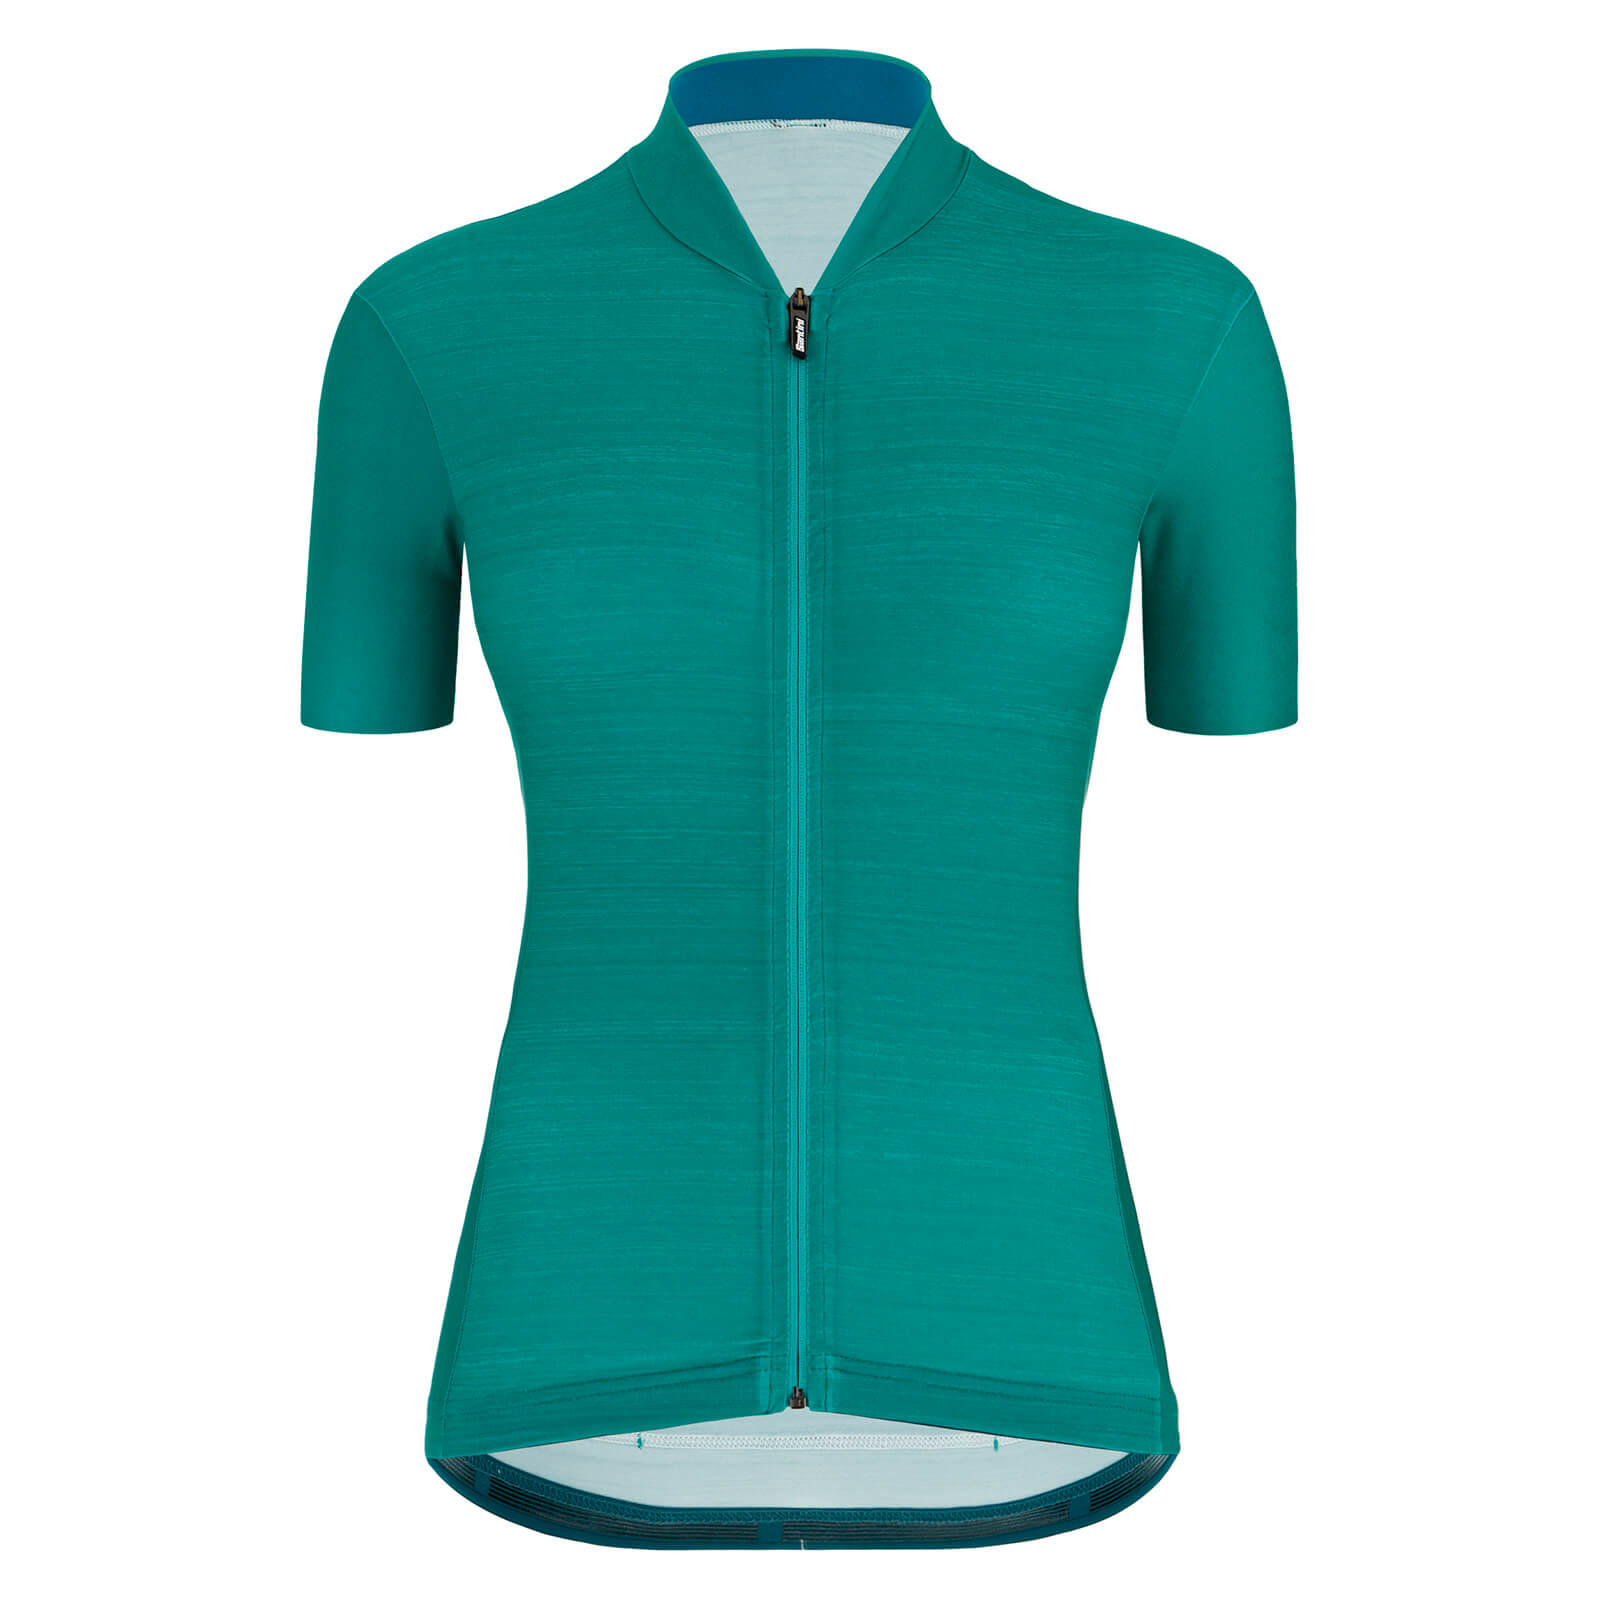 Santini Women's Colore Jersey - S - Petrol Green